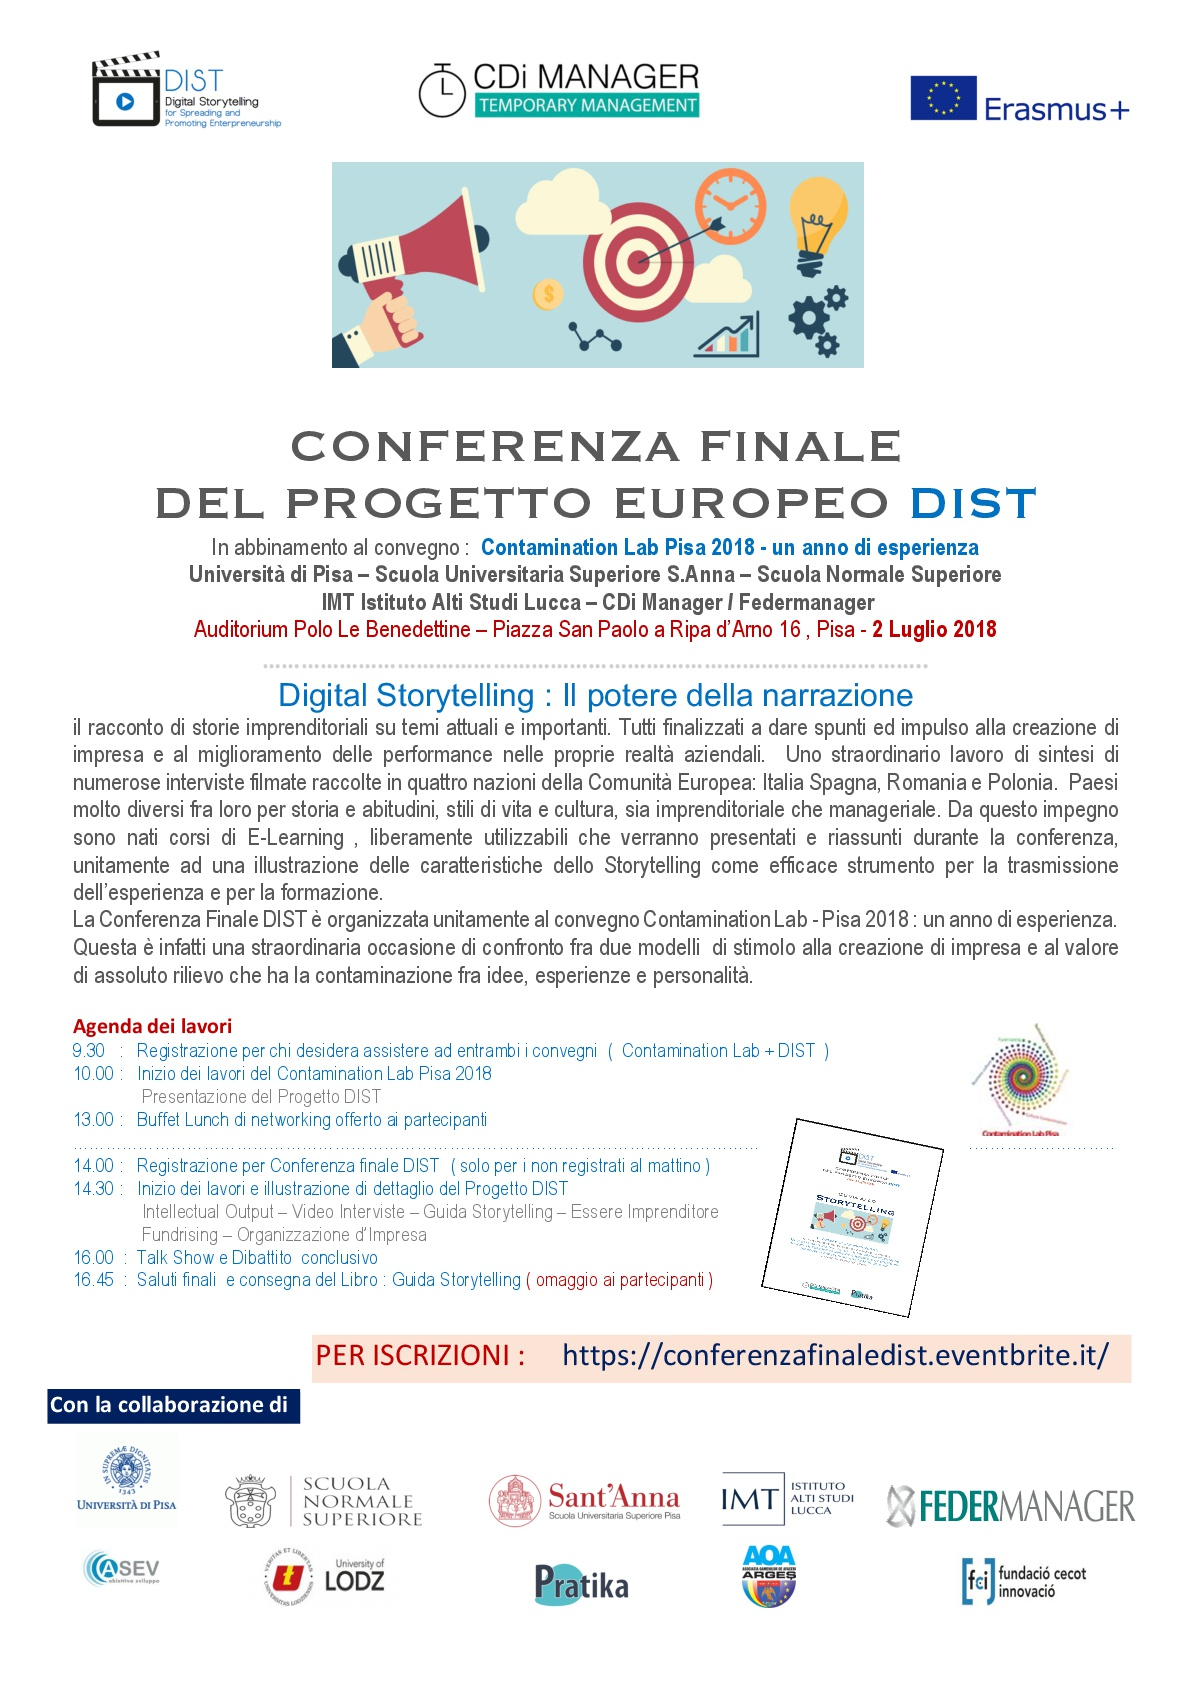 Conferenza finale Dist